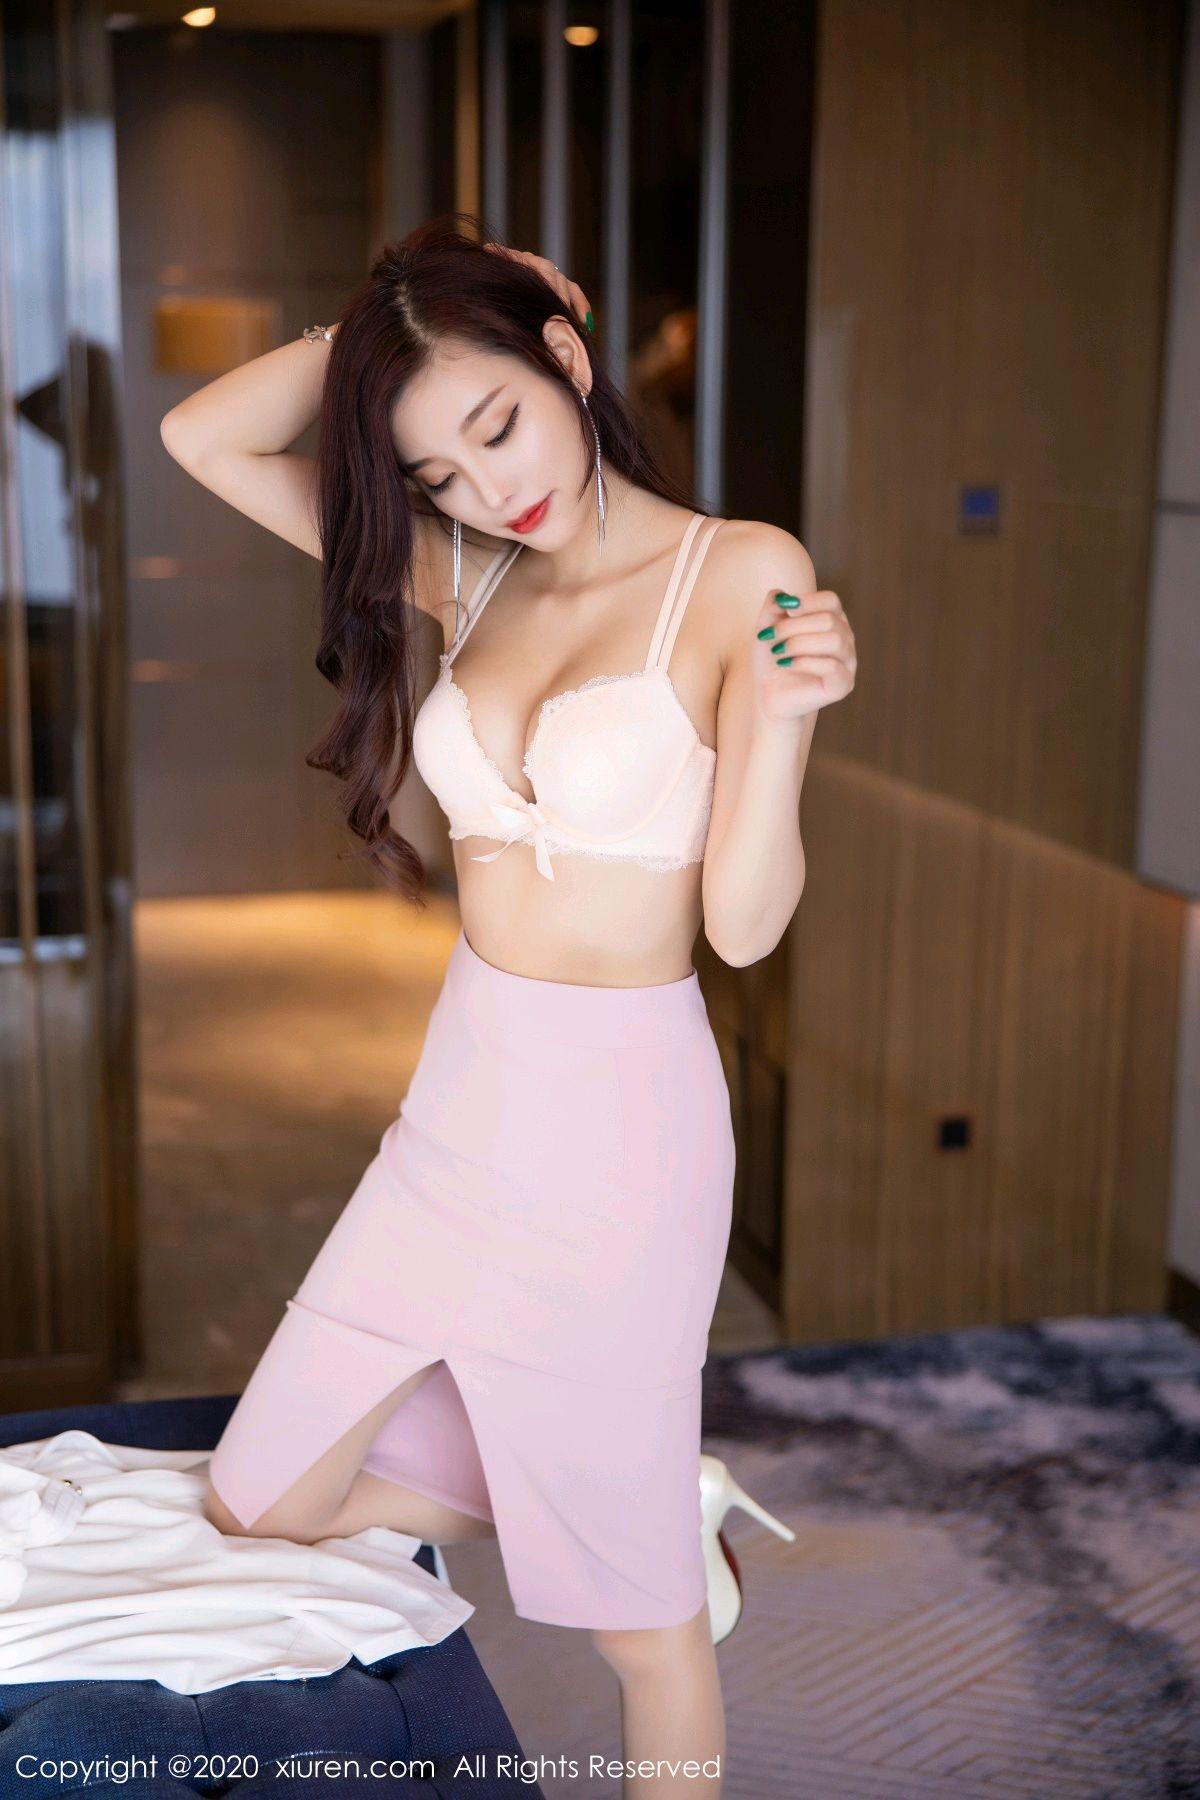 [XiuRen] Vol.2431 Yang Chen Chen 58P, Tall, Underwear, Uniform, Xiuren, Yang Chen Chen